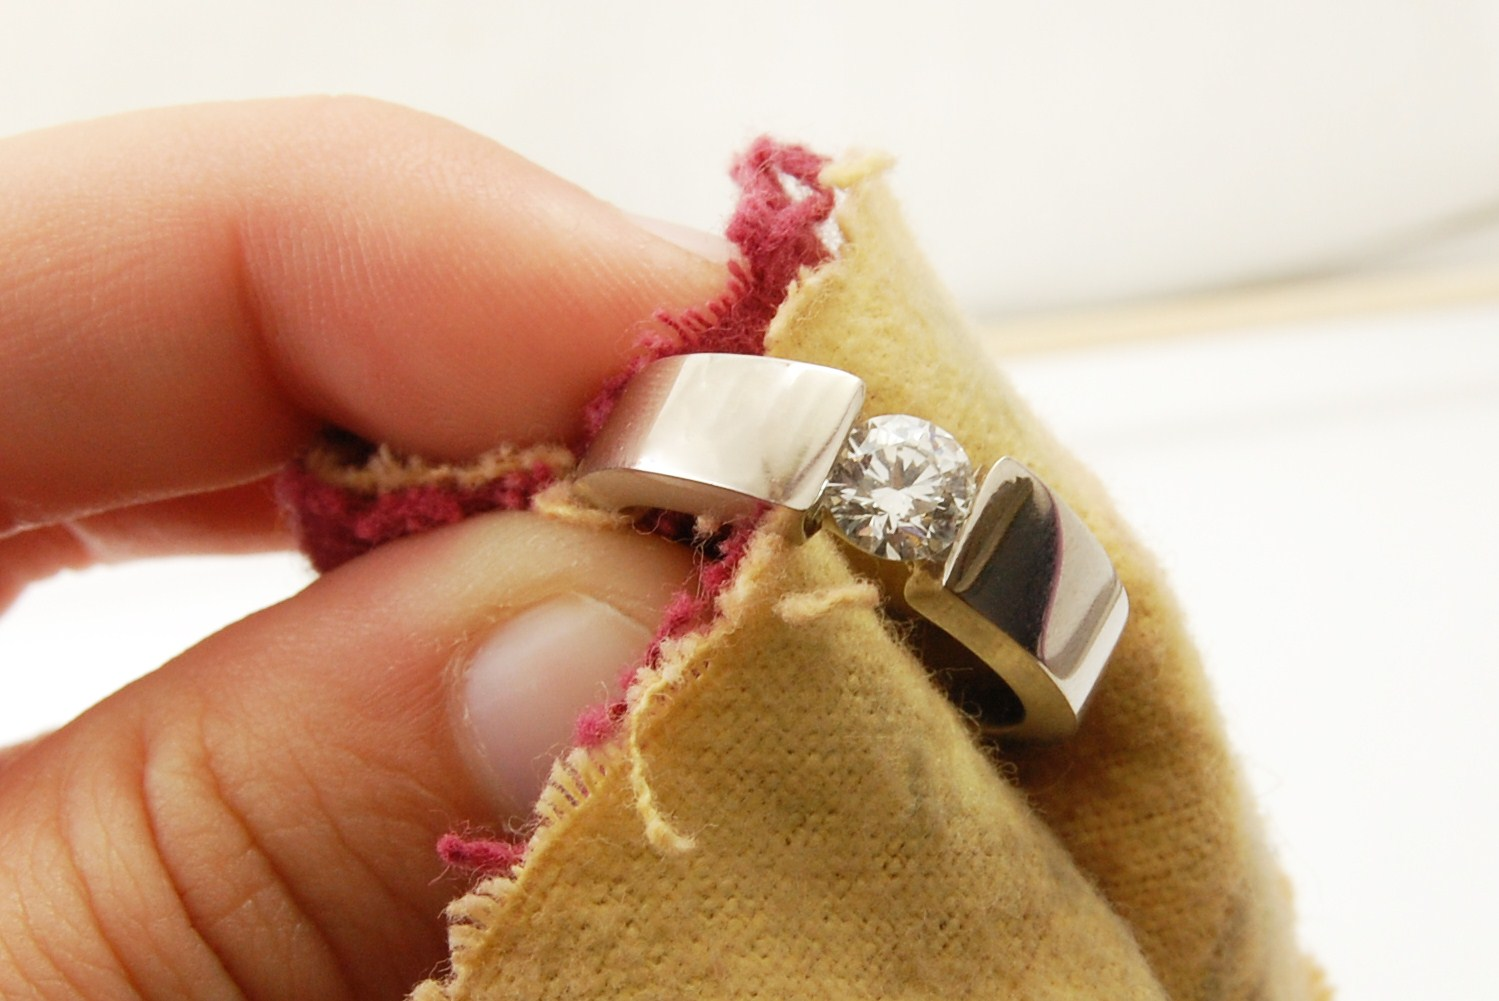 Как почистить серебро в домашних условиях? 17